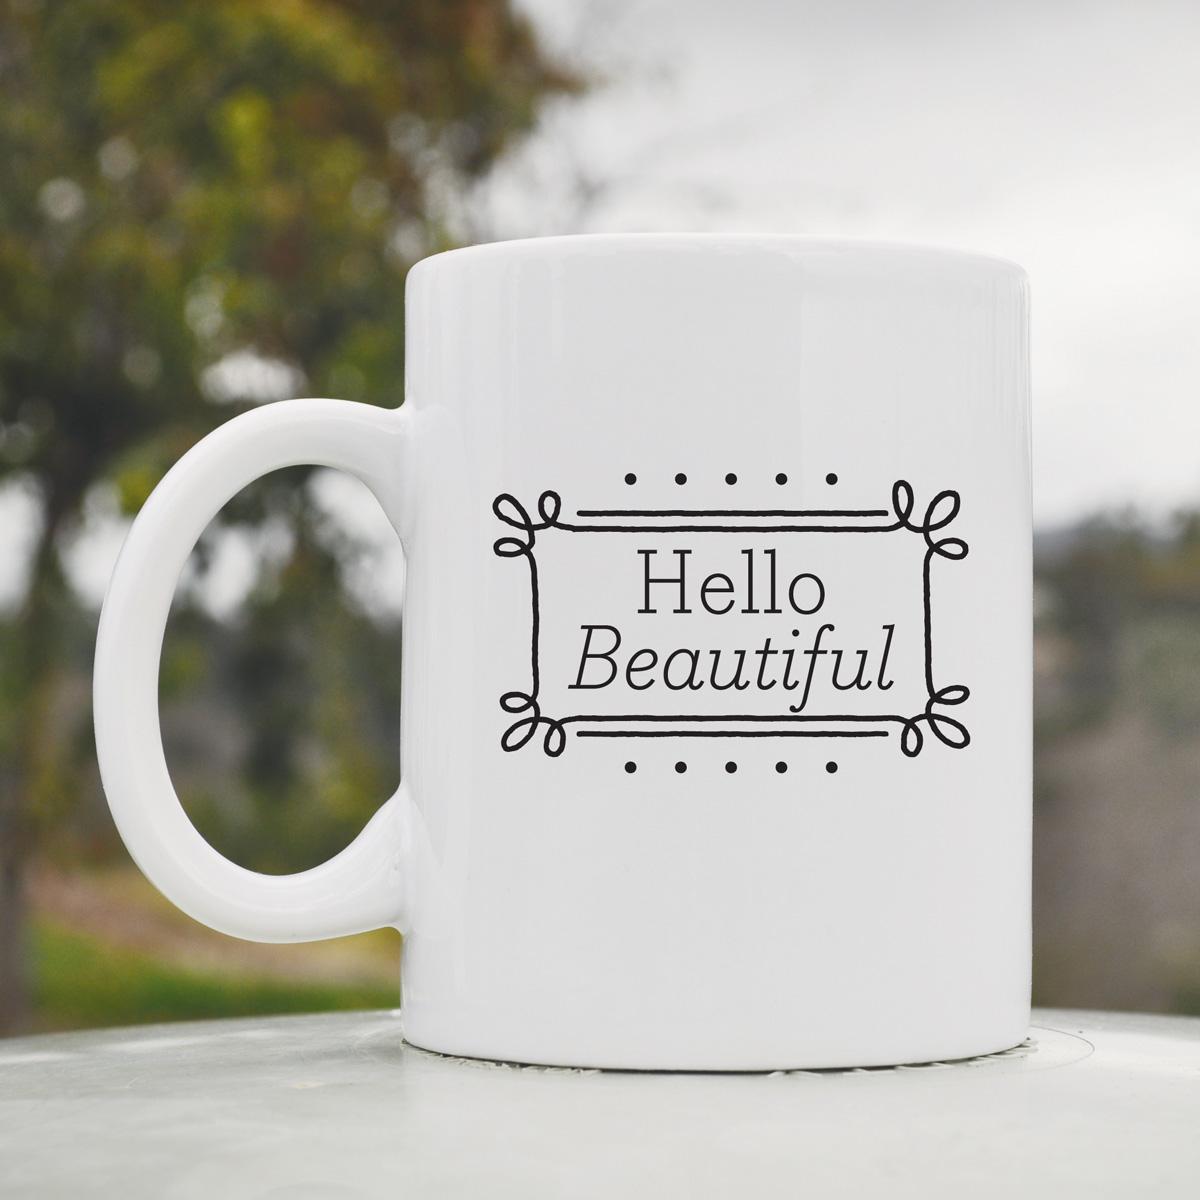 The Mug Coffee >> Hello Beautiful Coffee Mug - 11 oz